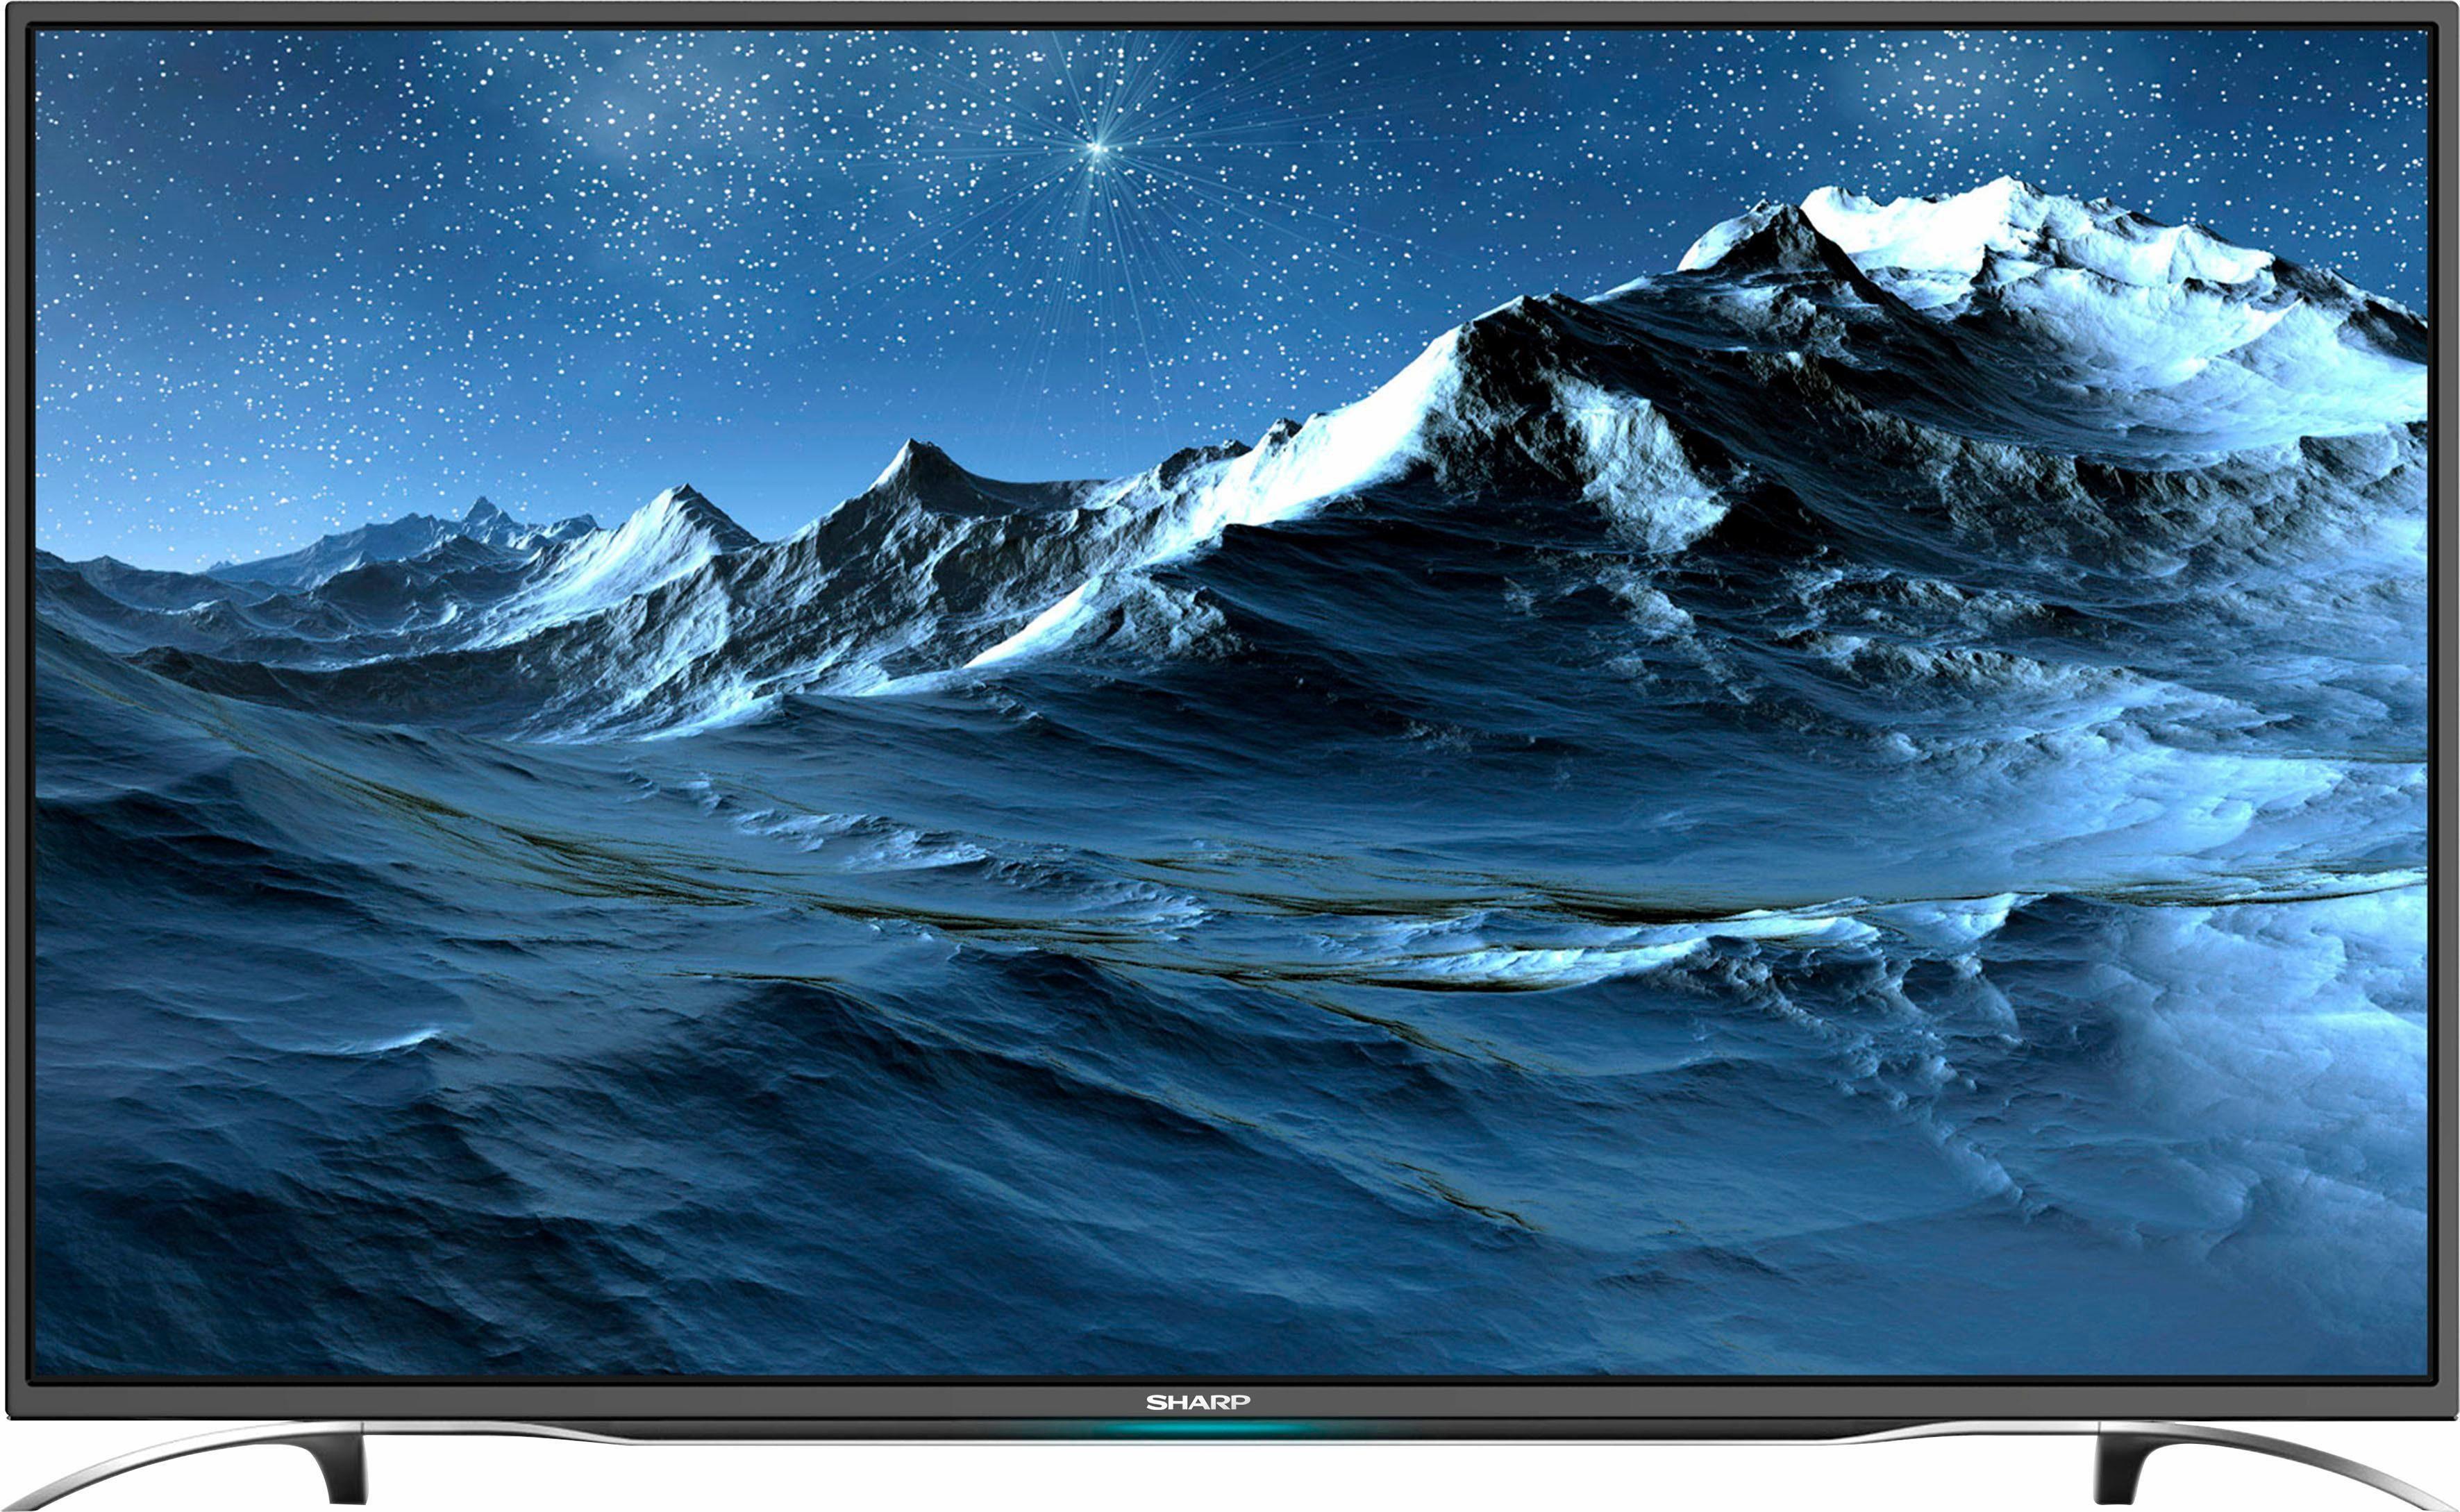 Sharp LC-55CFG6352E LED-Fernseher (55 Zoll, Full HD, Smart-TV)